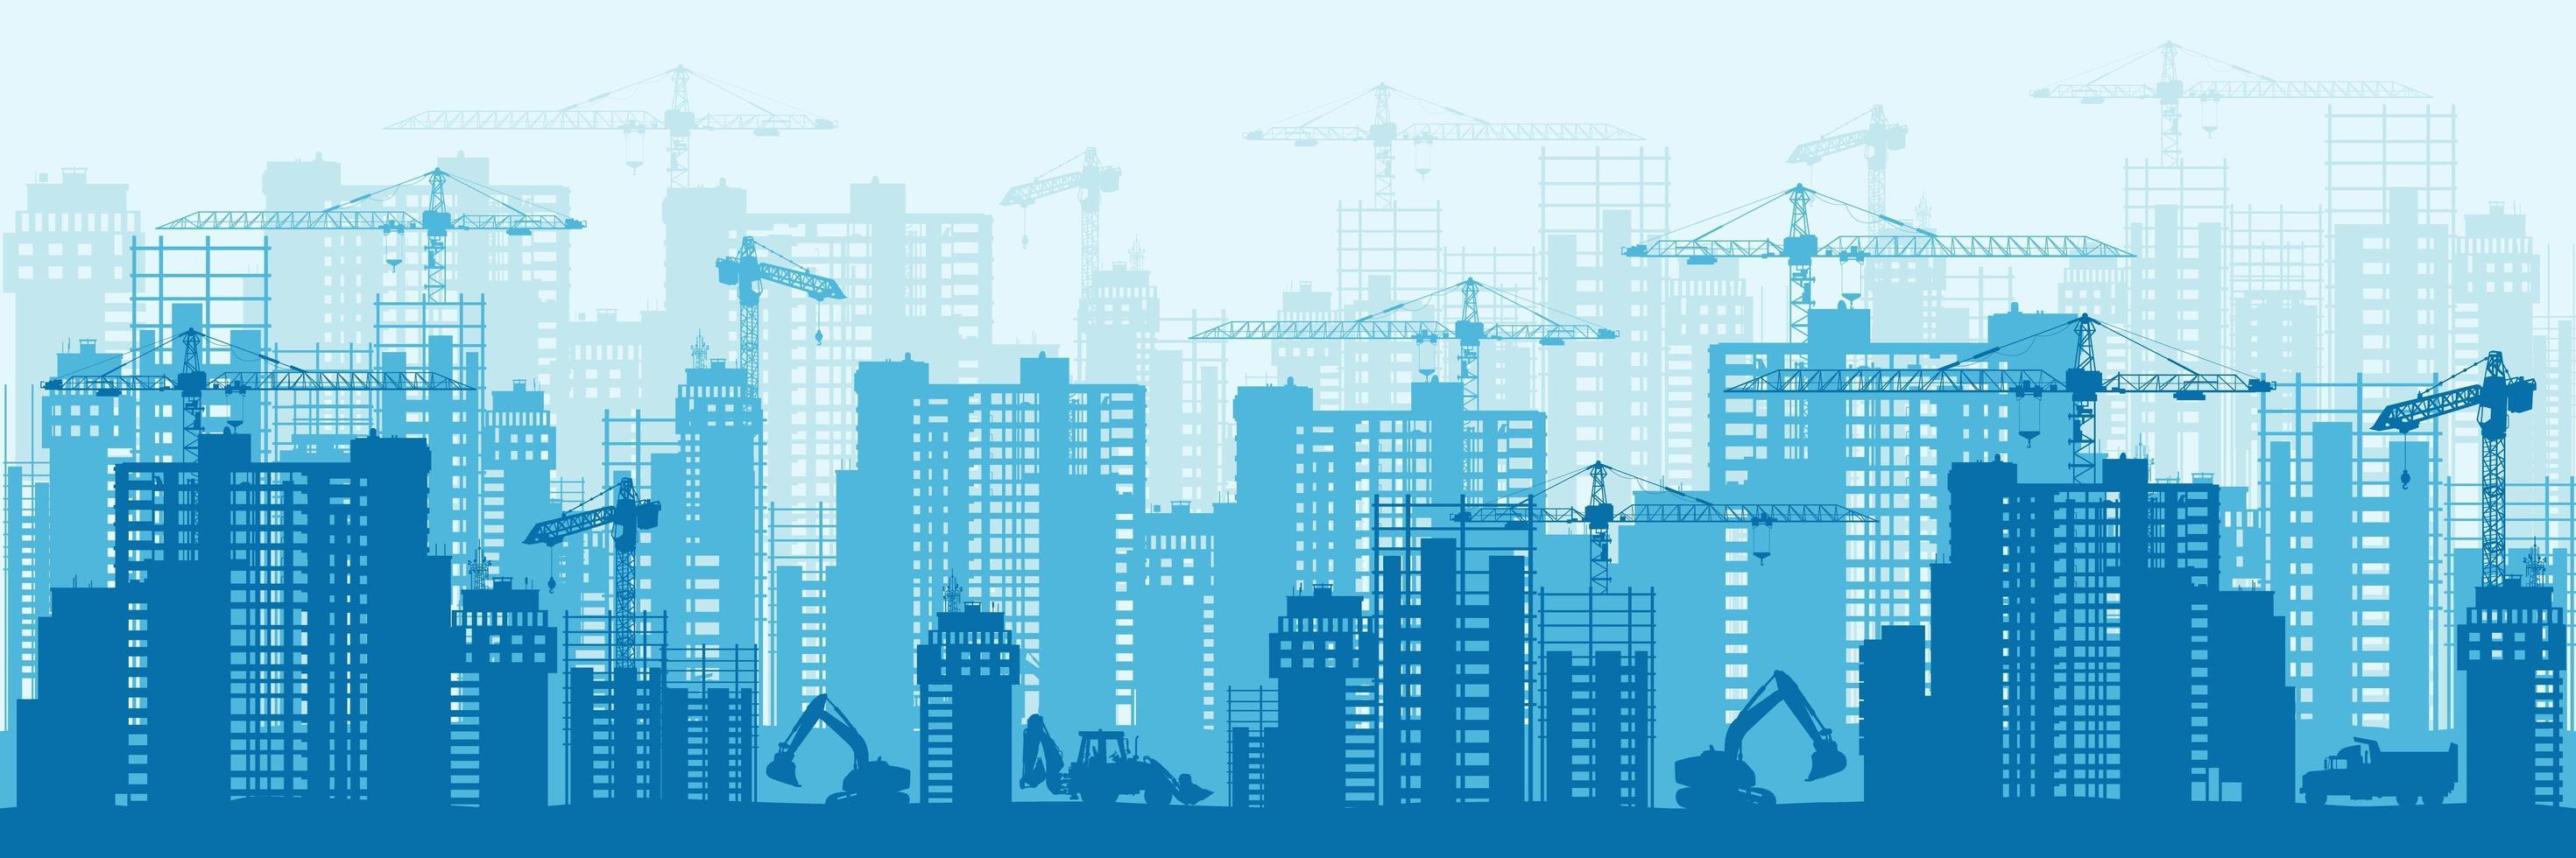 blaues Stadtentwicklungsschattenbilddesign vektor